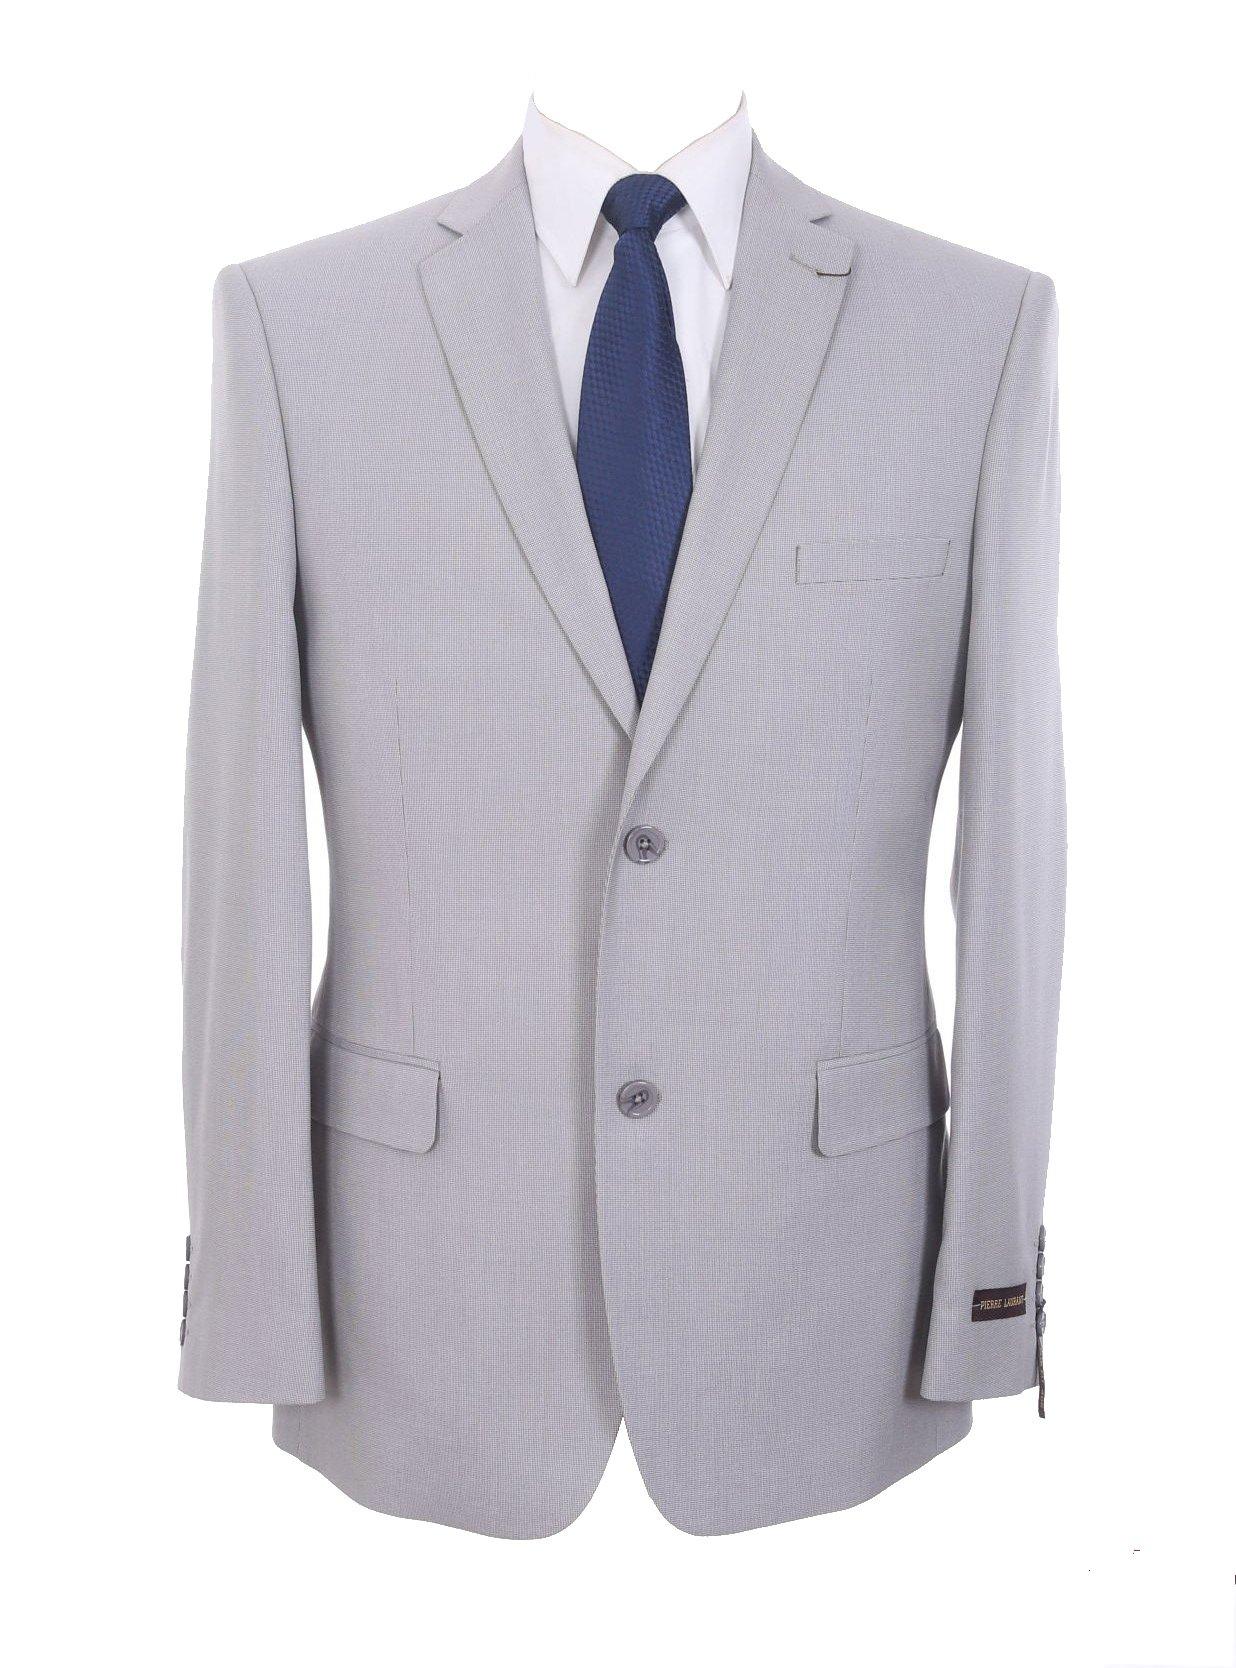 P&L Men's Classic Fit Casual Two Button Blazer Jacket